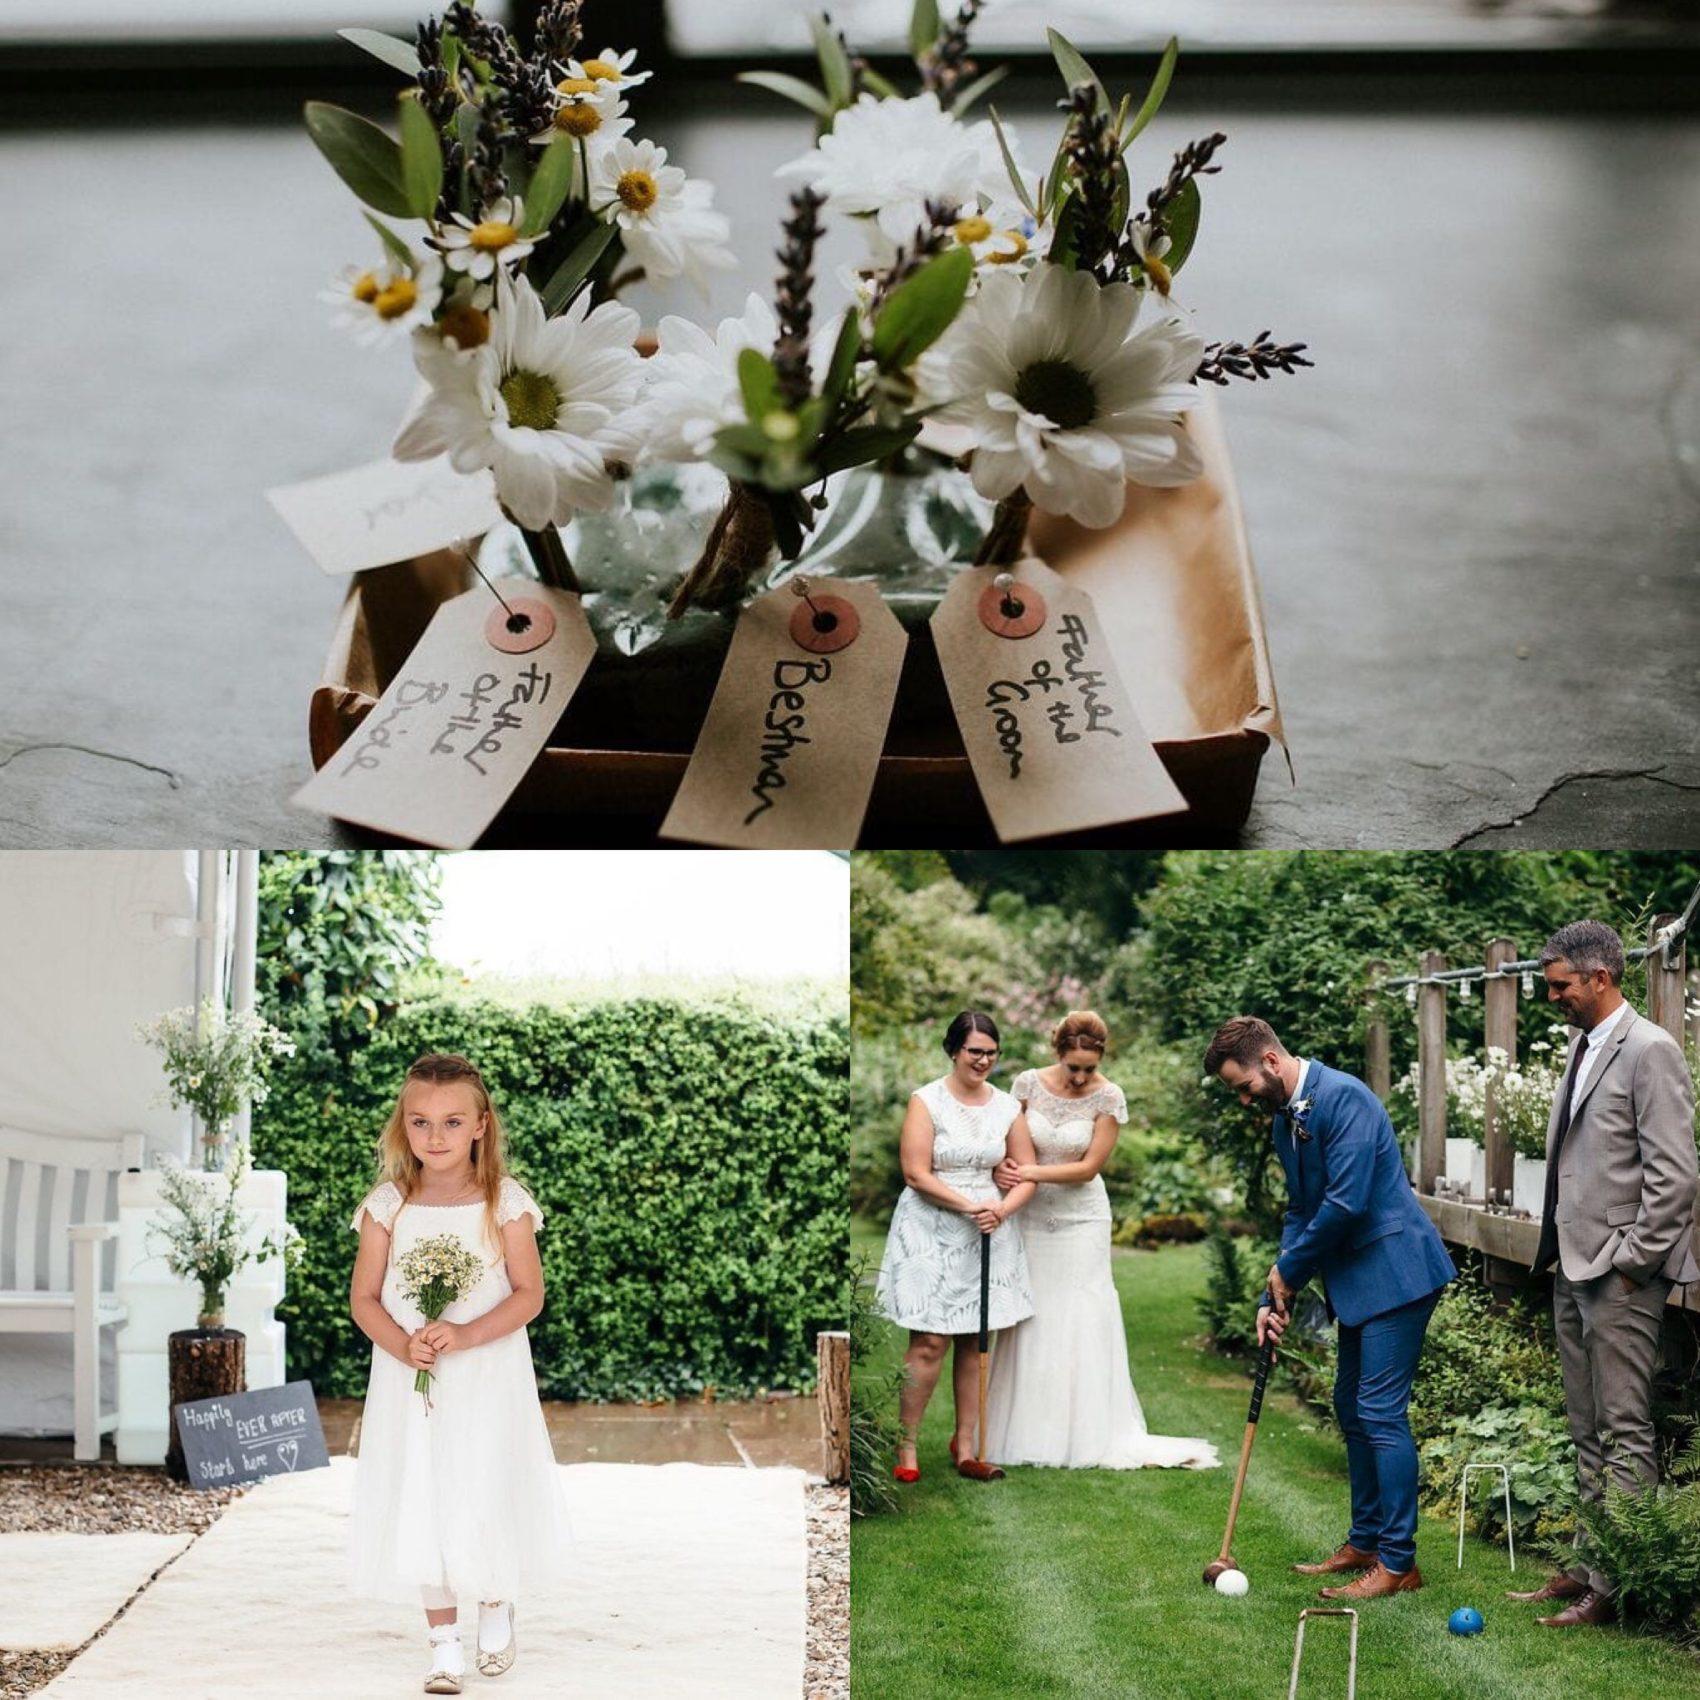 Flowers, details, children, kids, games, lawn games, wedding, entertainments, flower girl, croquet, guests, friends, ever after, summer, lower grenofen, party